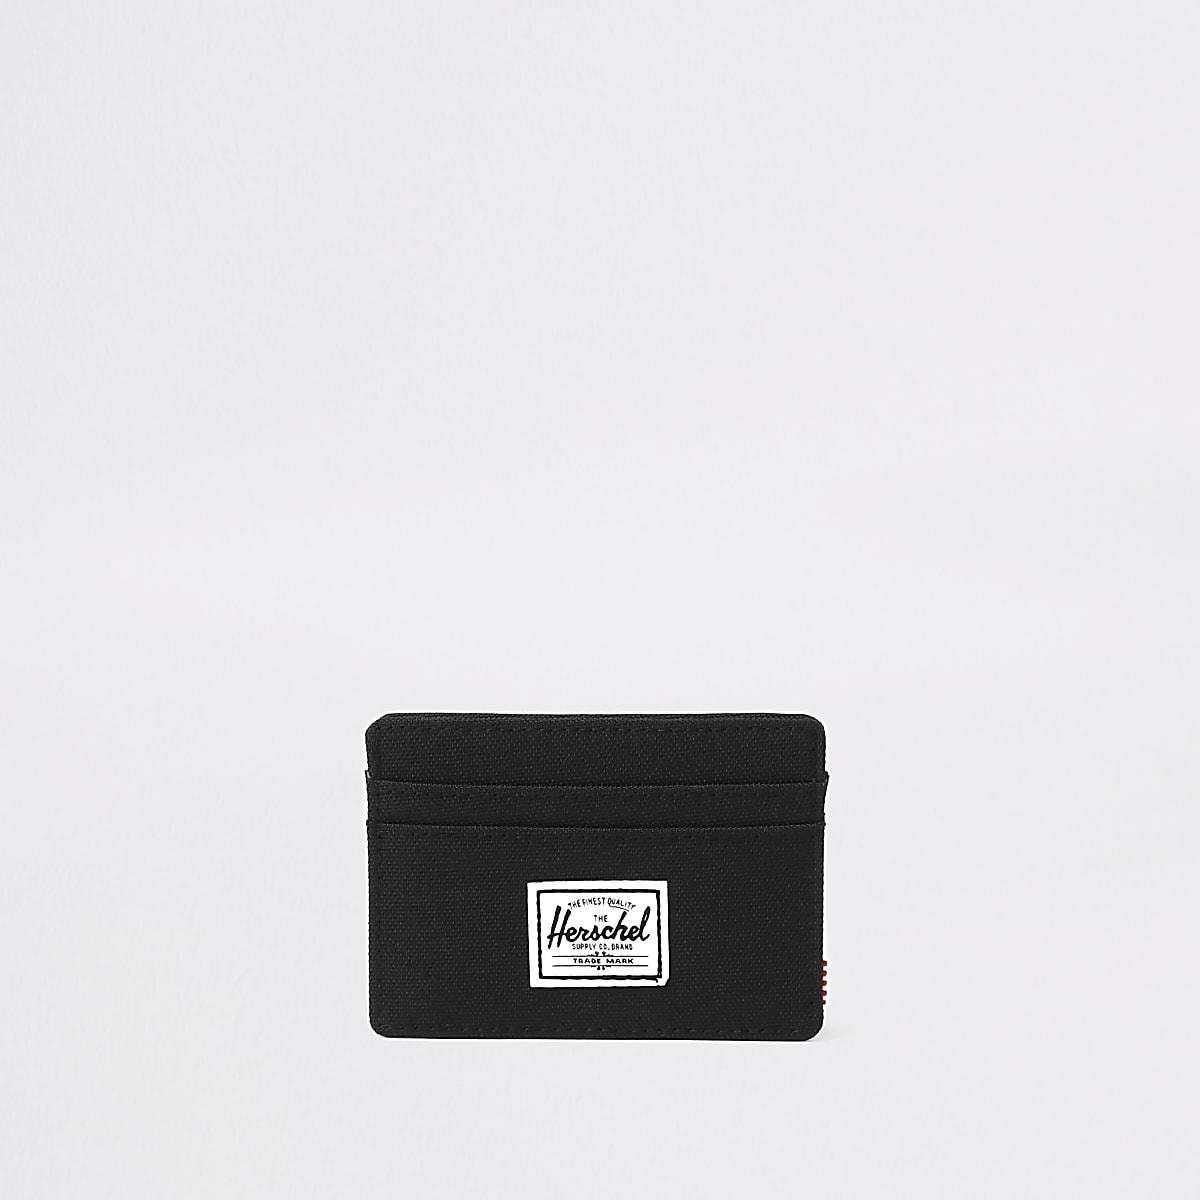 Herschel black Charlie cardholder